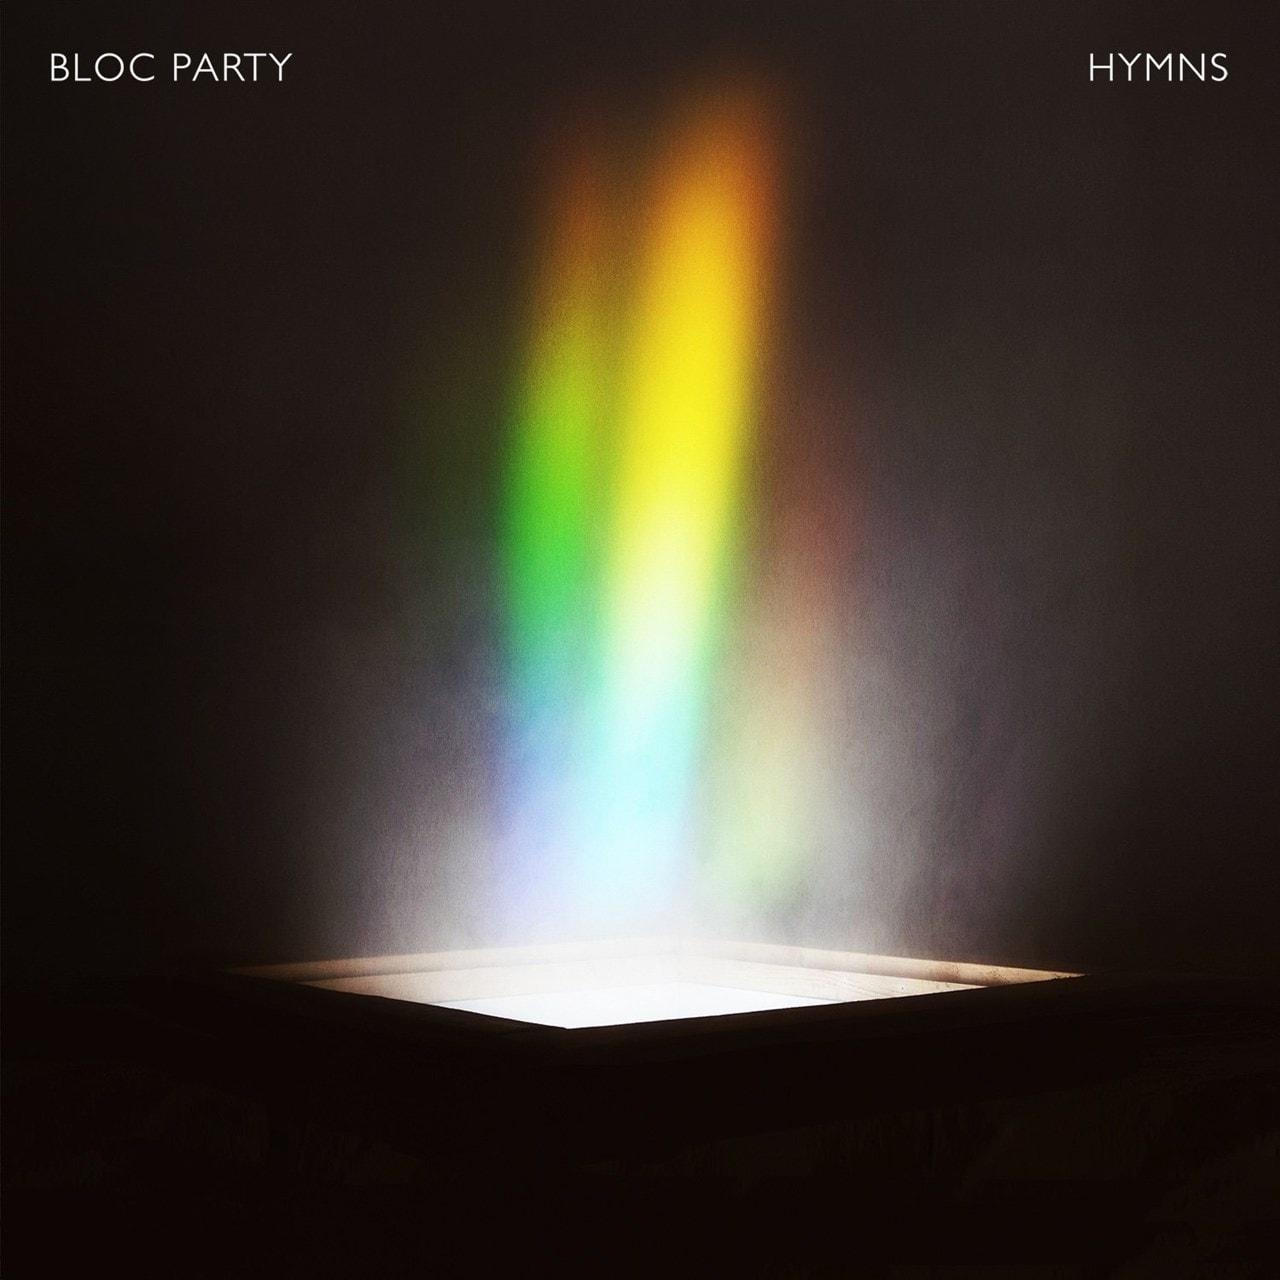 Hymns - 1